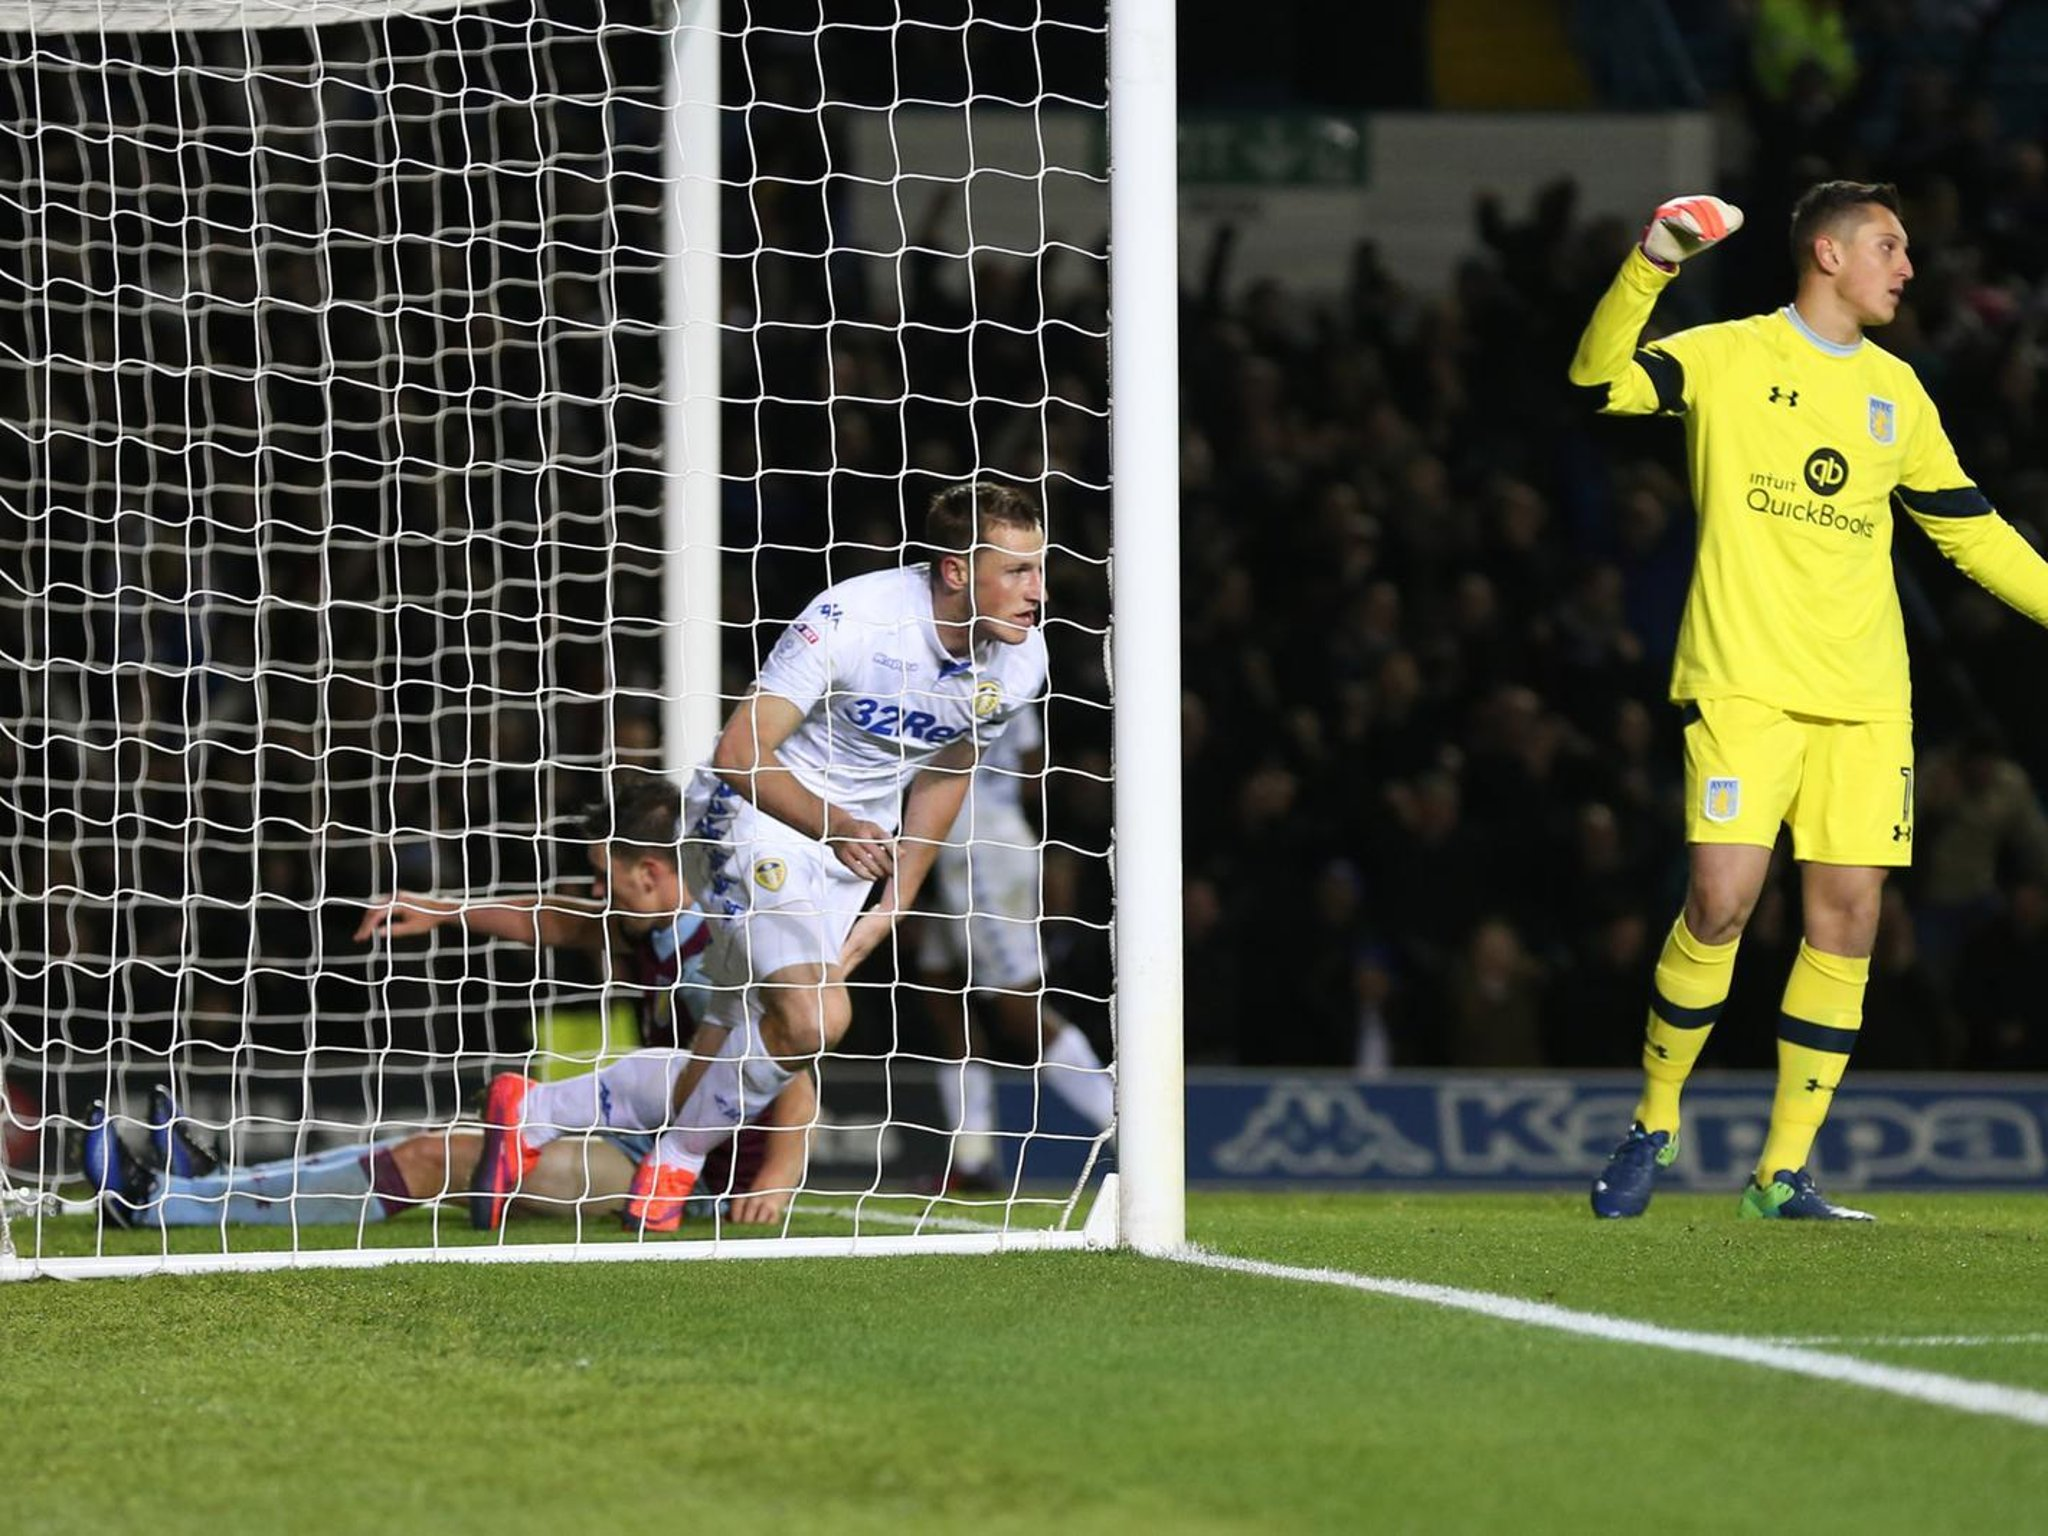 Kemar Roofe and Chris Wood ignited dramatic new Leeds United series against Aston Villa